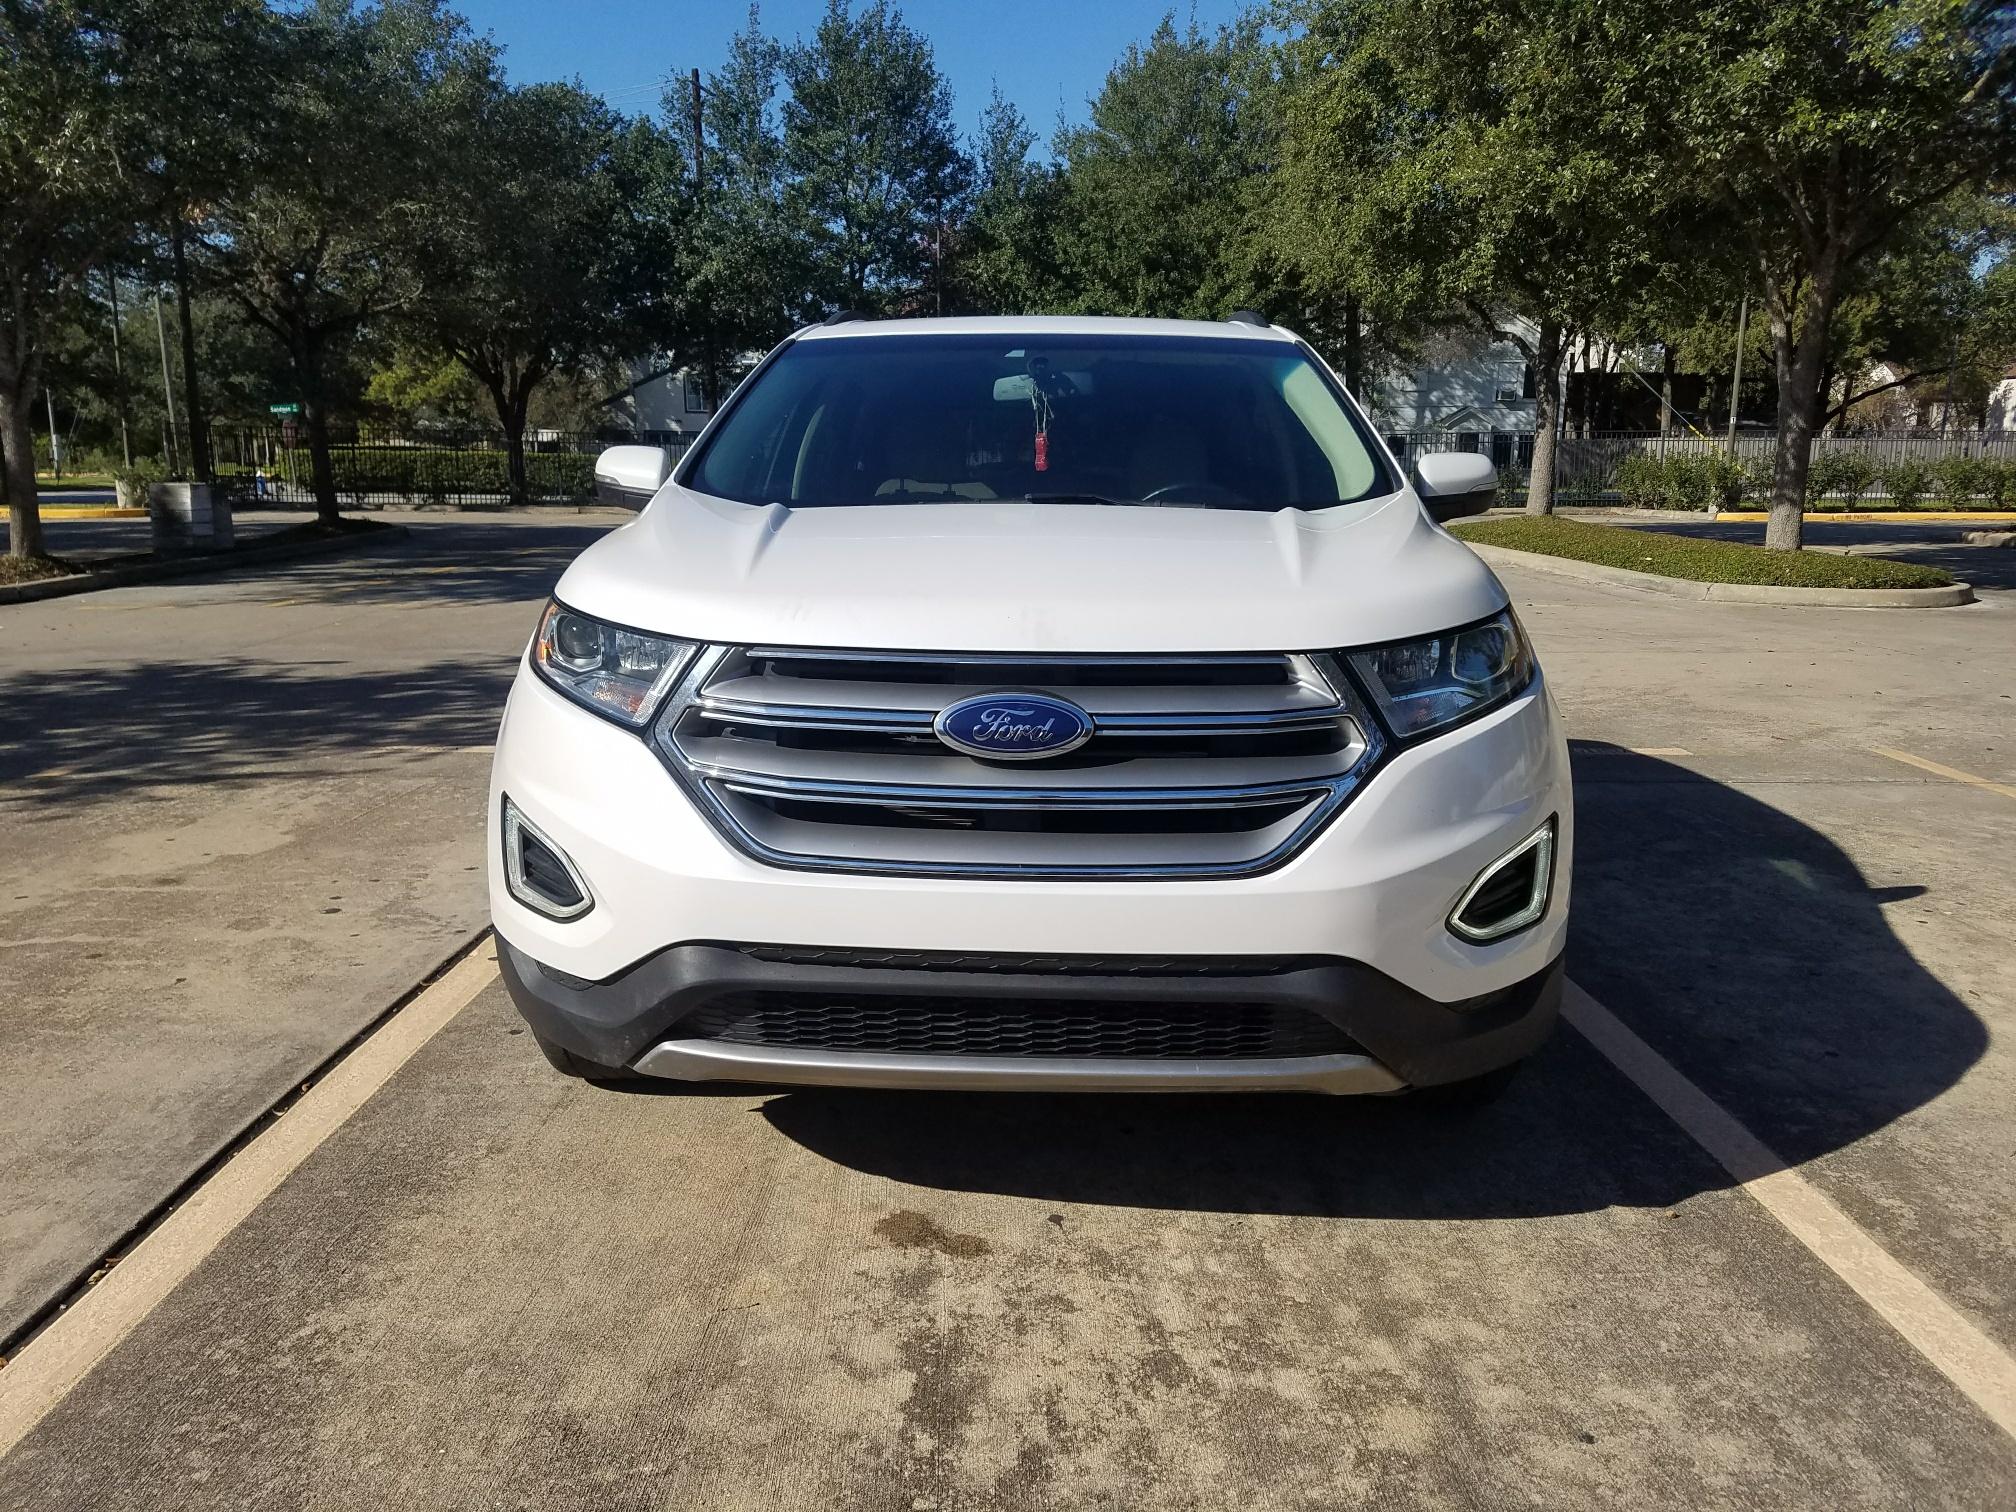 Ford_edge_2015_SEL_AWD_white (2)